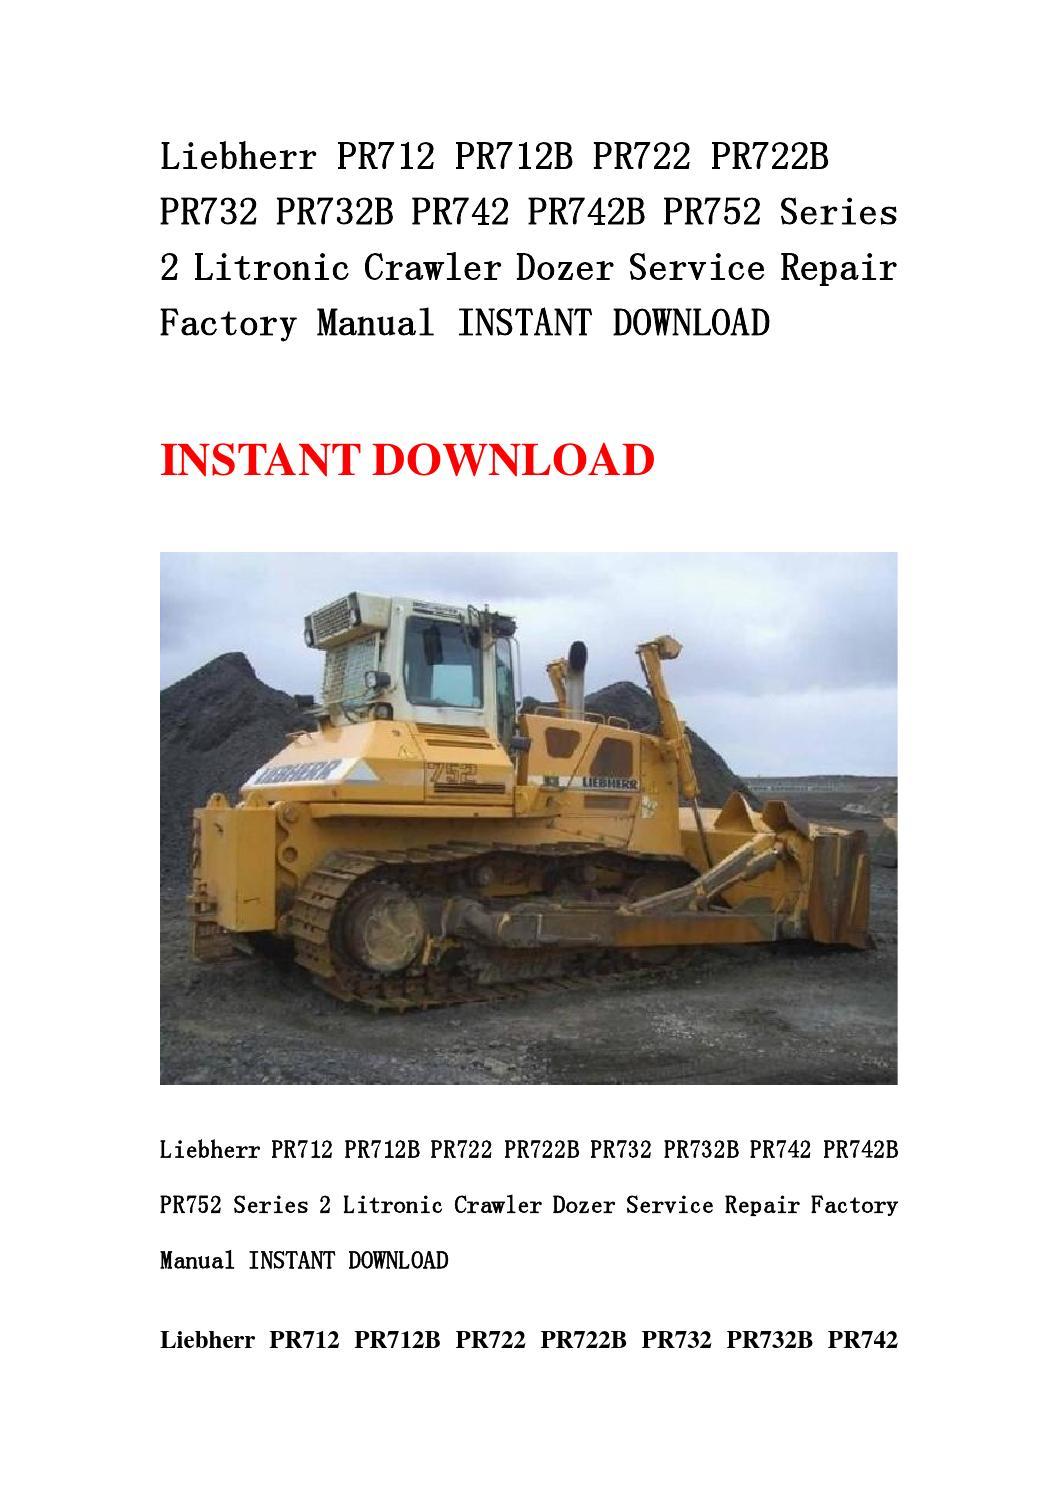 Liebherr Pr712 Pr712b Pr722 Pr722b Pr732 Pr732b Pr742